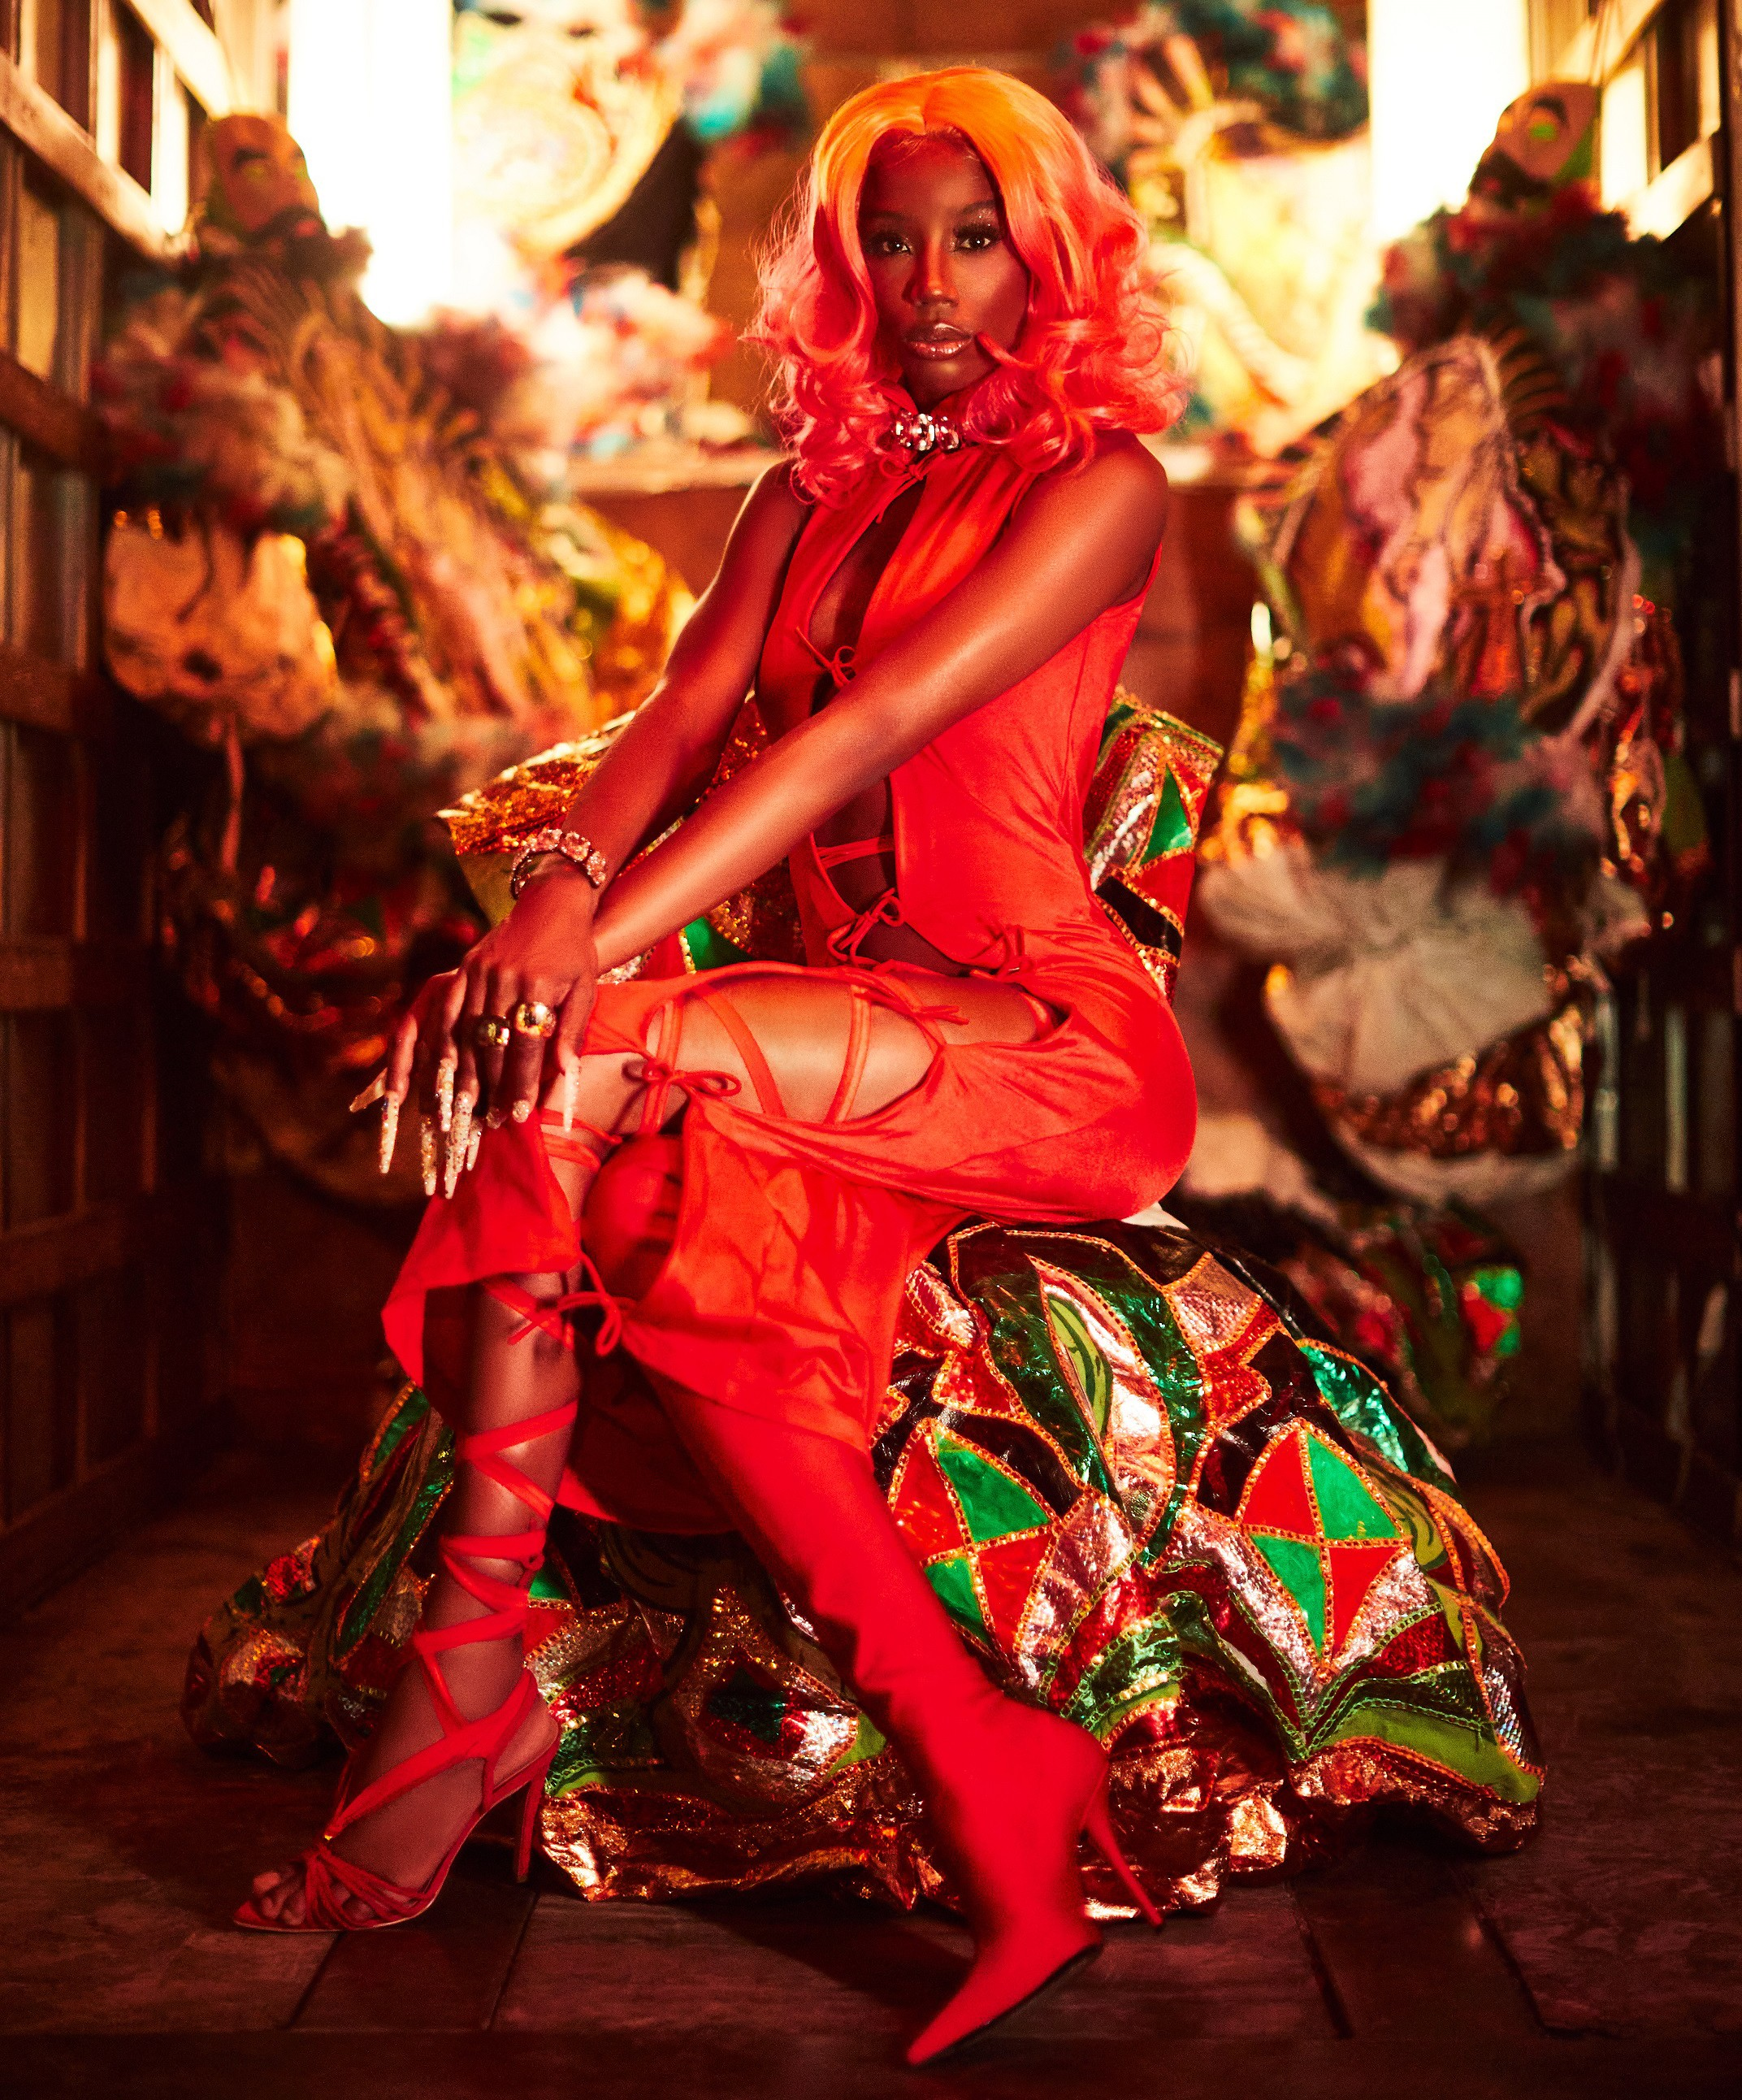 Malía segue a batida do trap e critica os críticos no single 'Brinco muito'